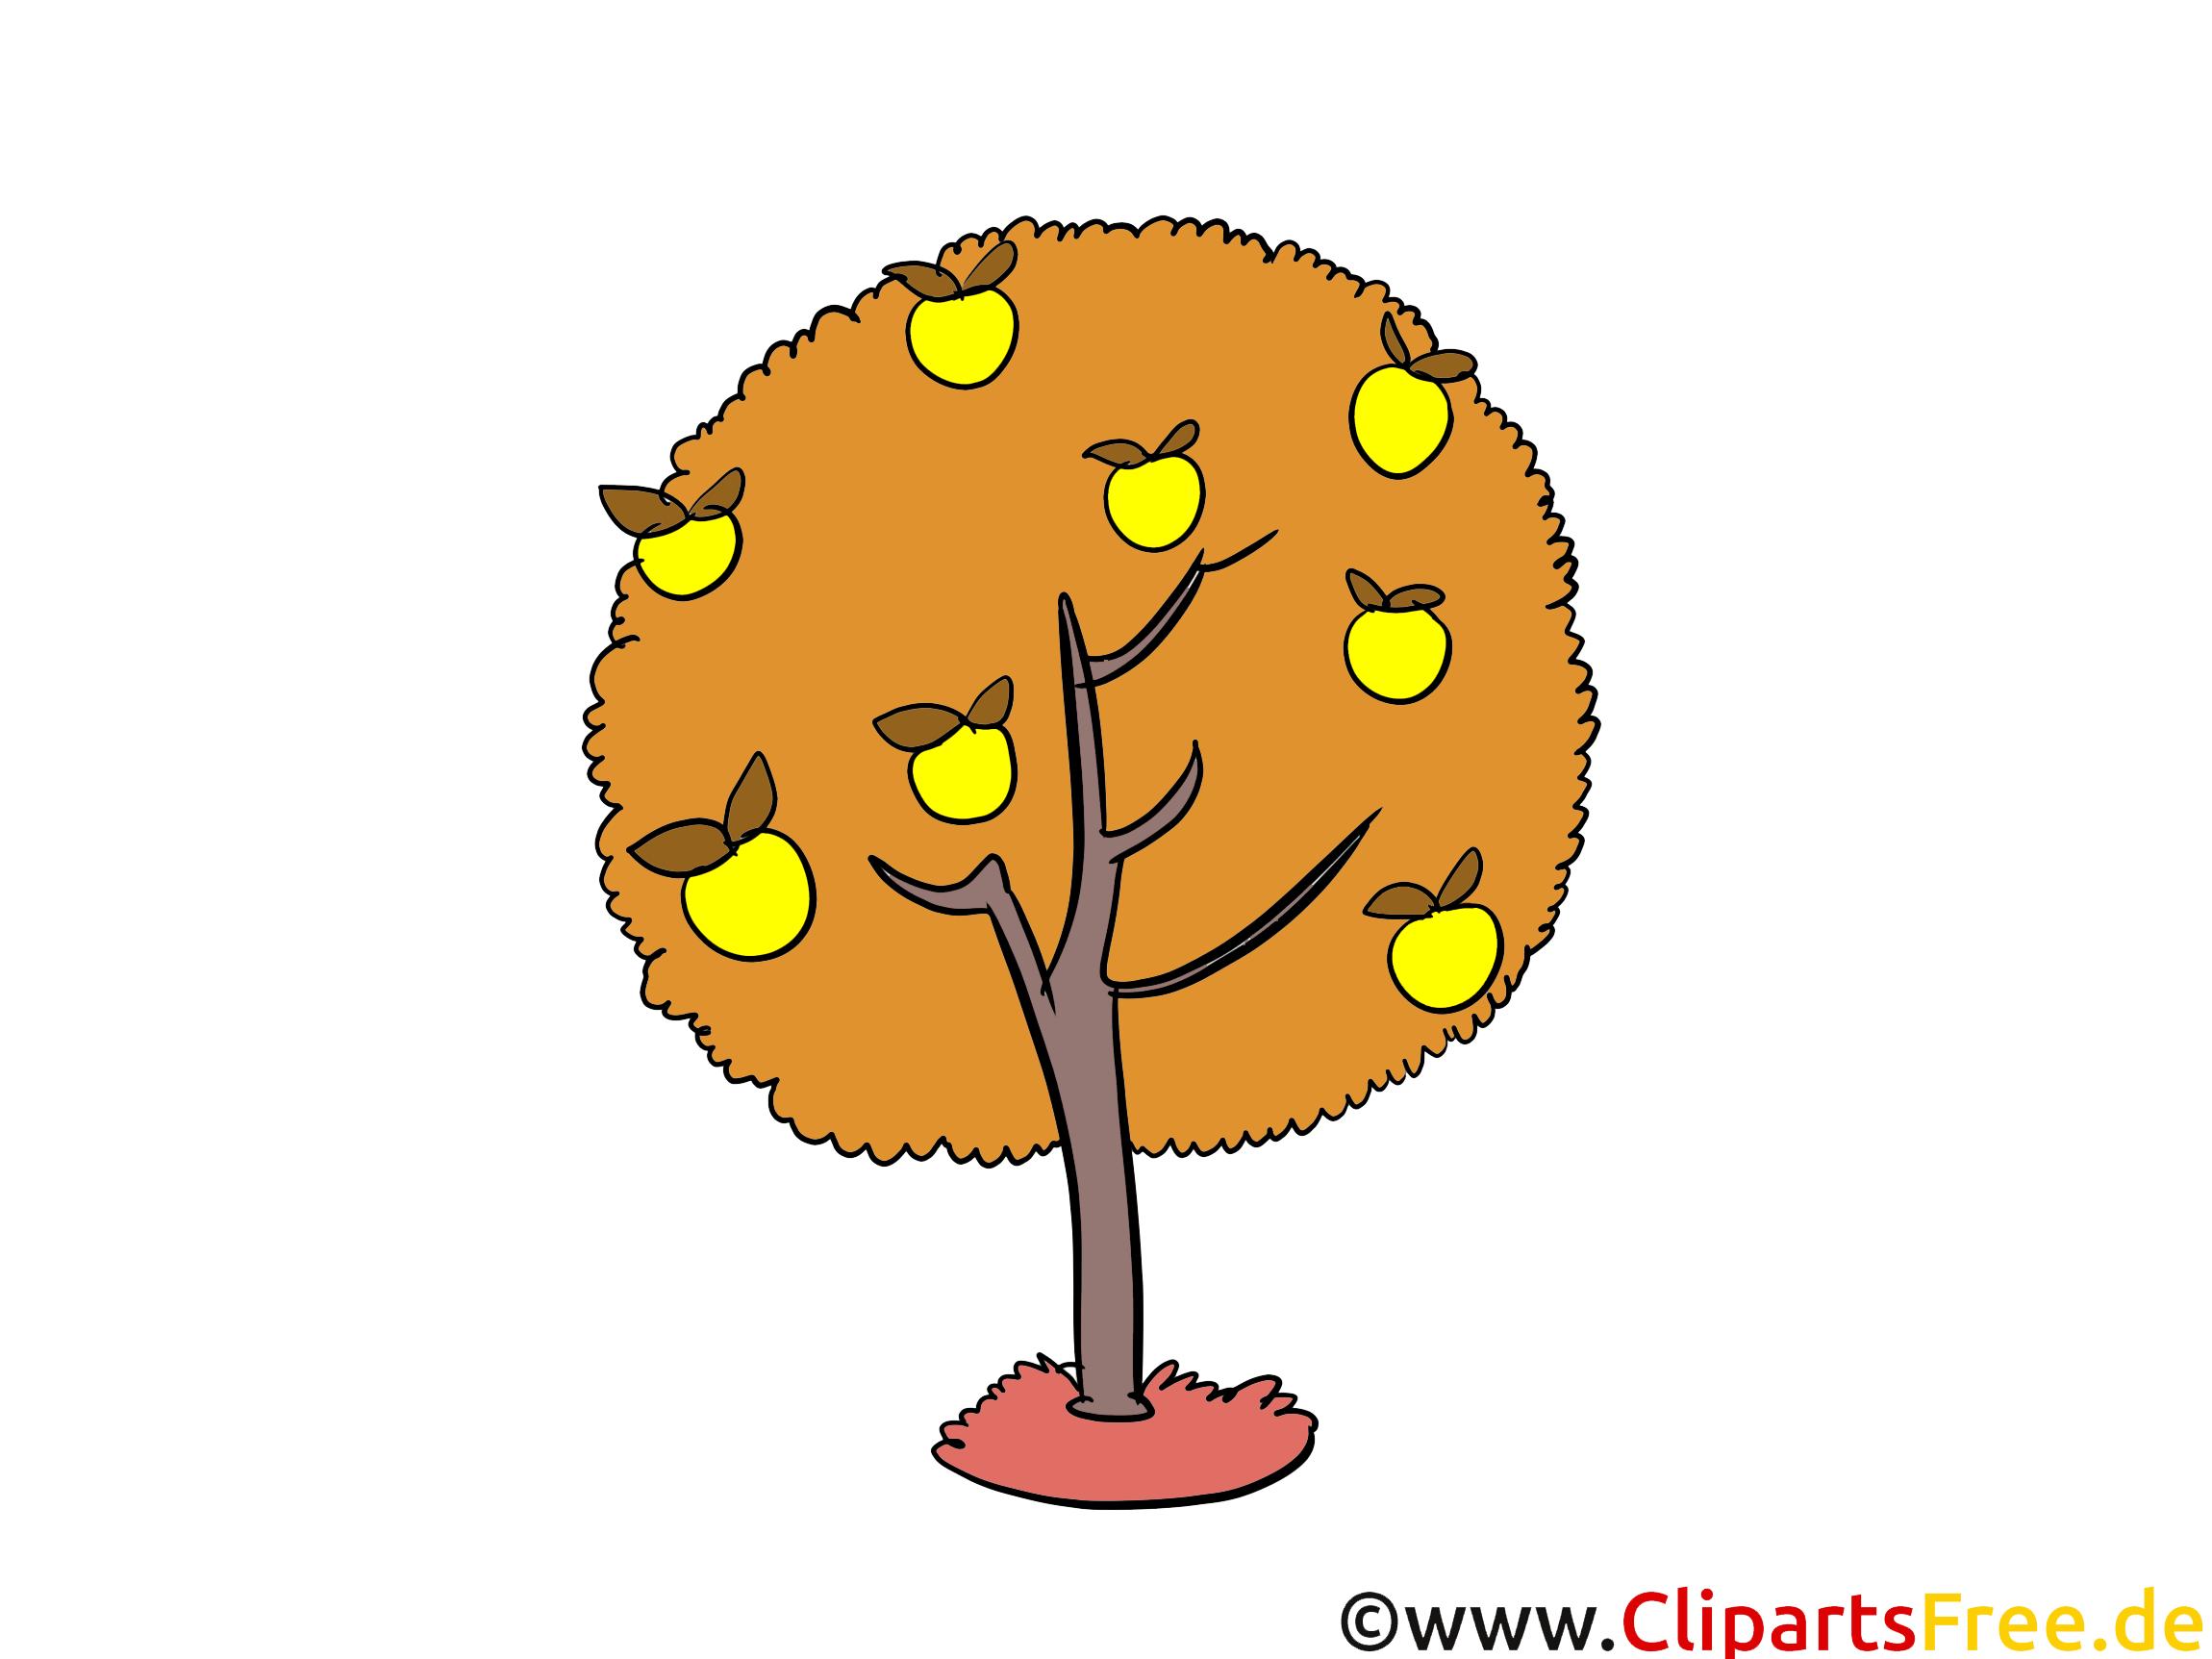 Apfelbaum im Herbst Clipart, Grafik, Illustration gratis